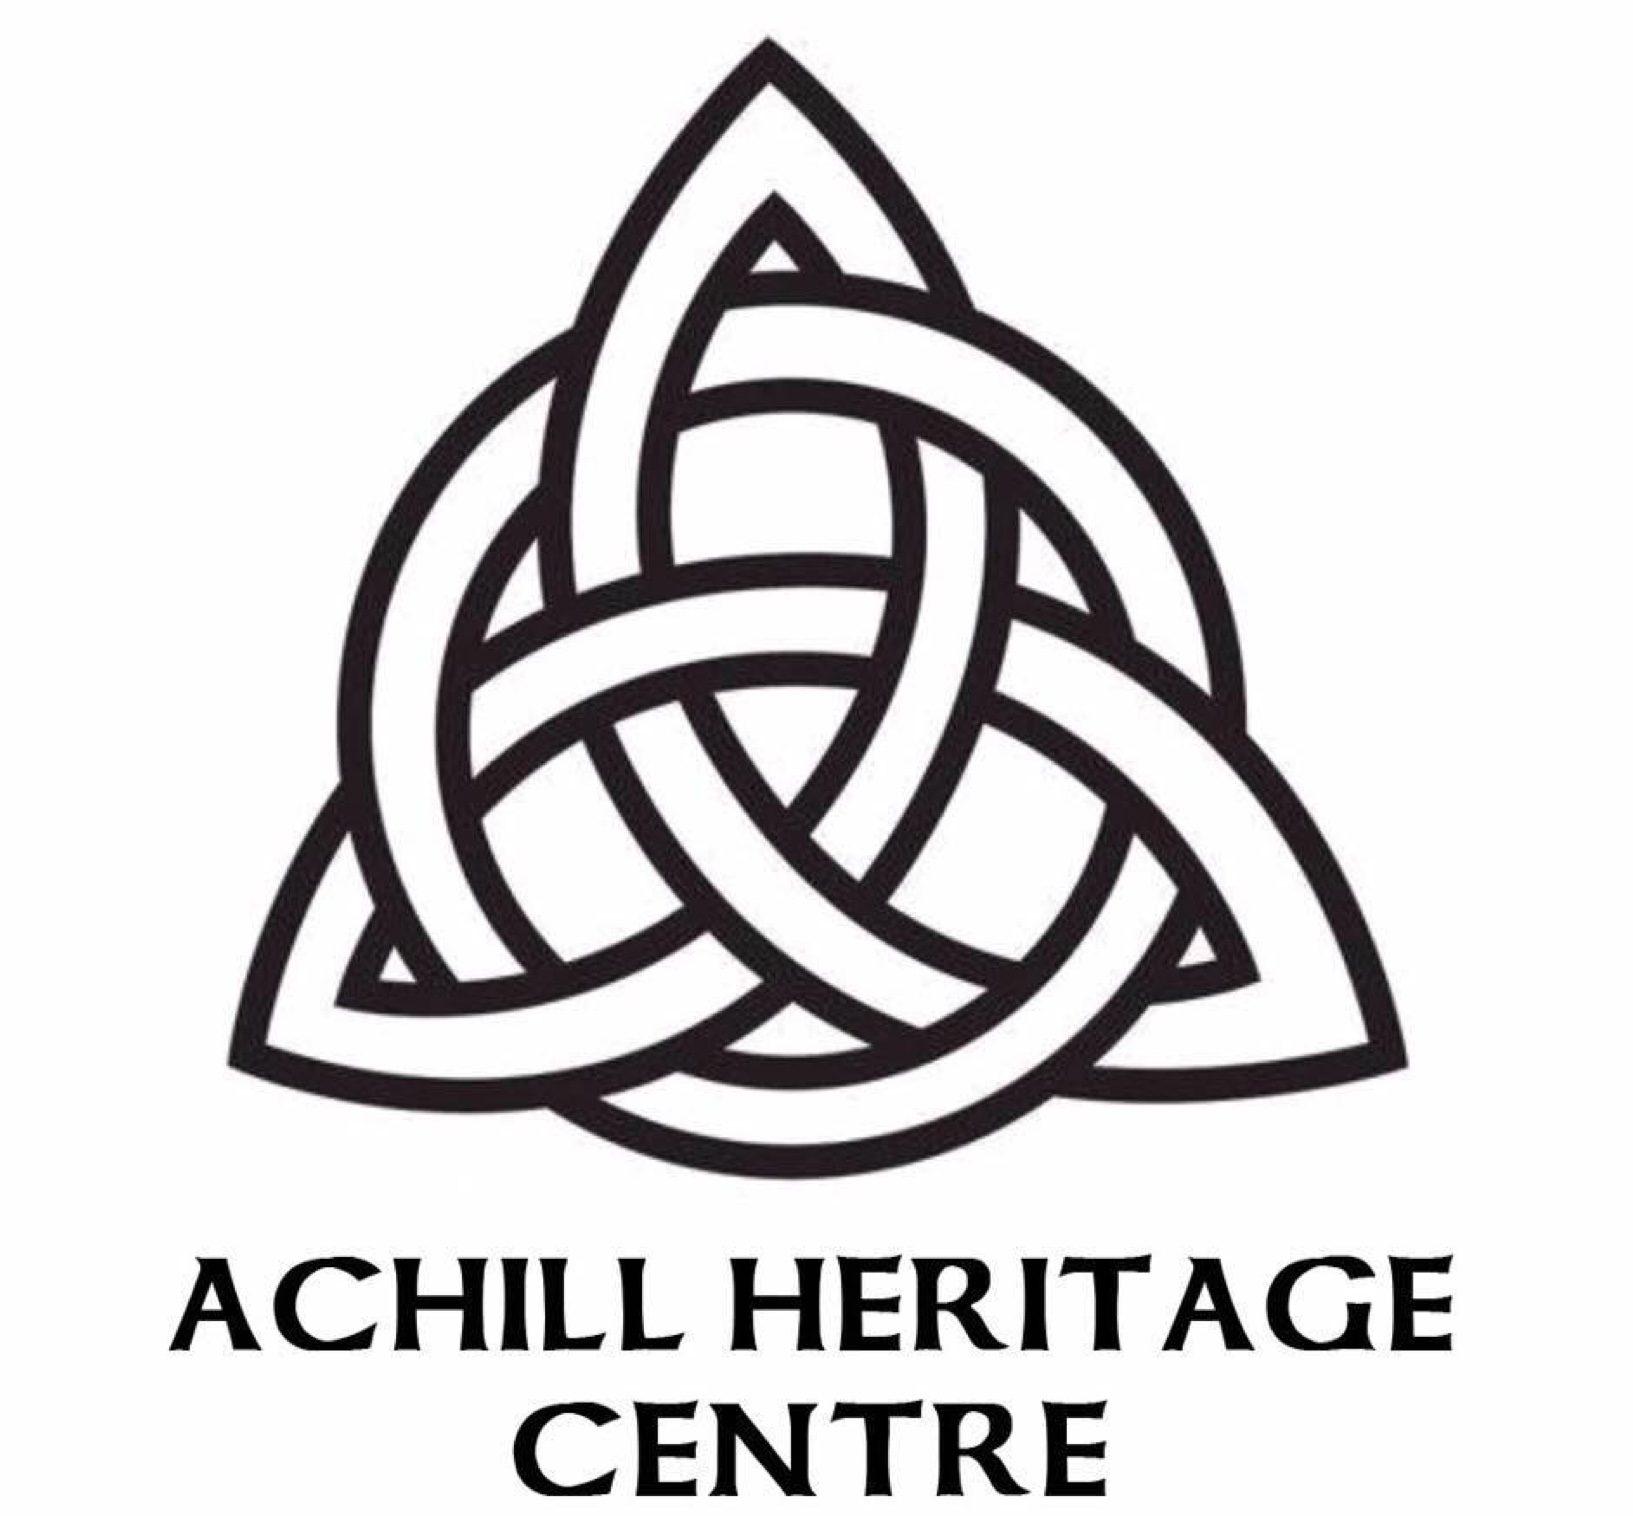 Achill Heritage